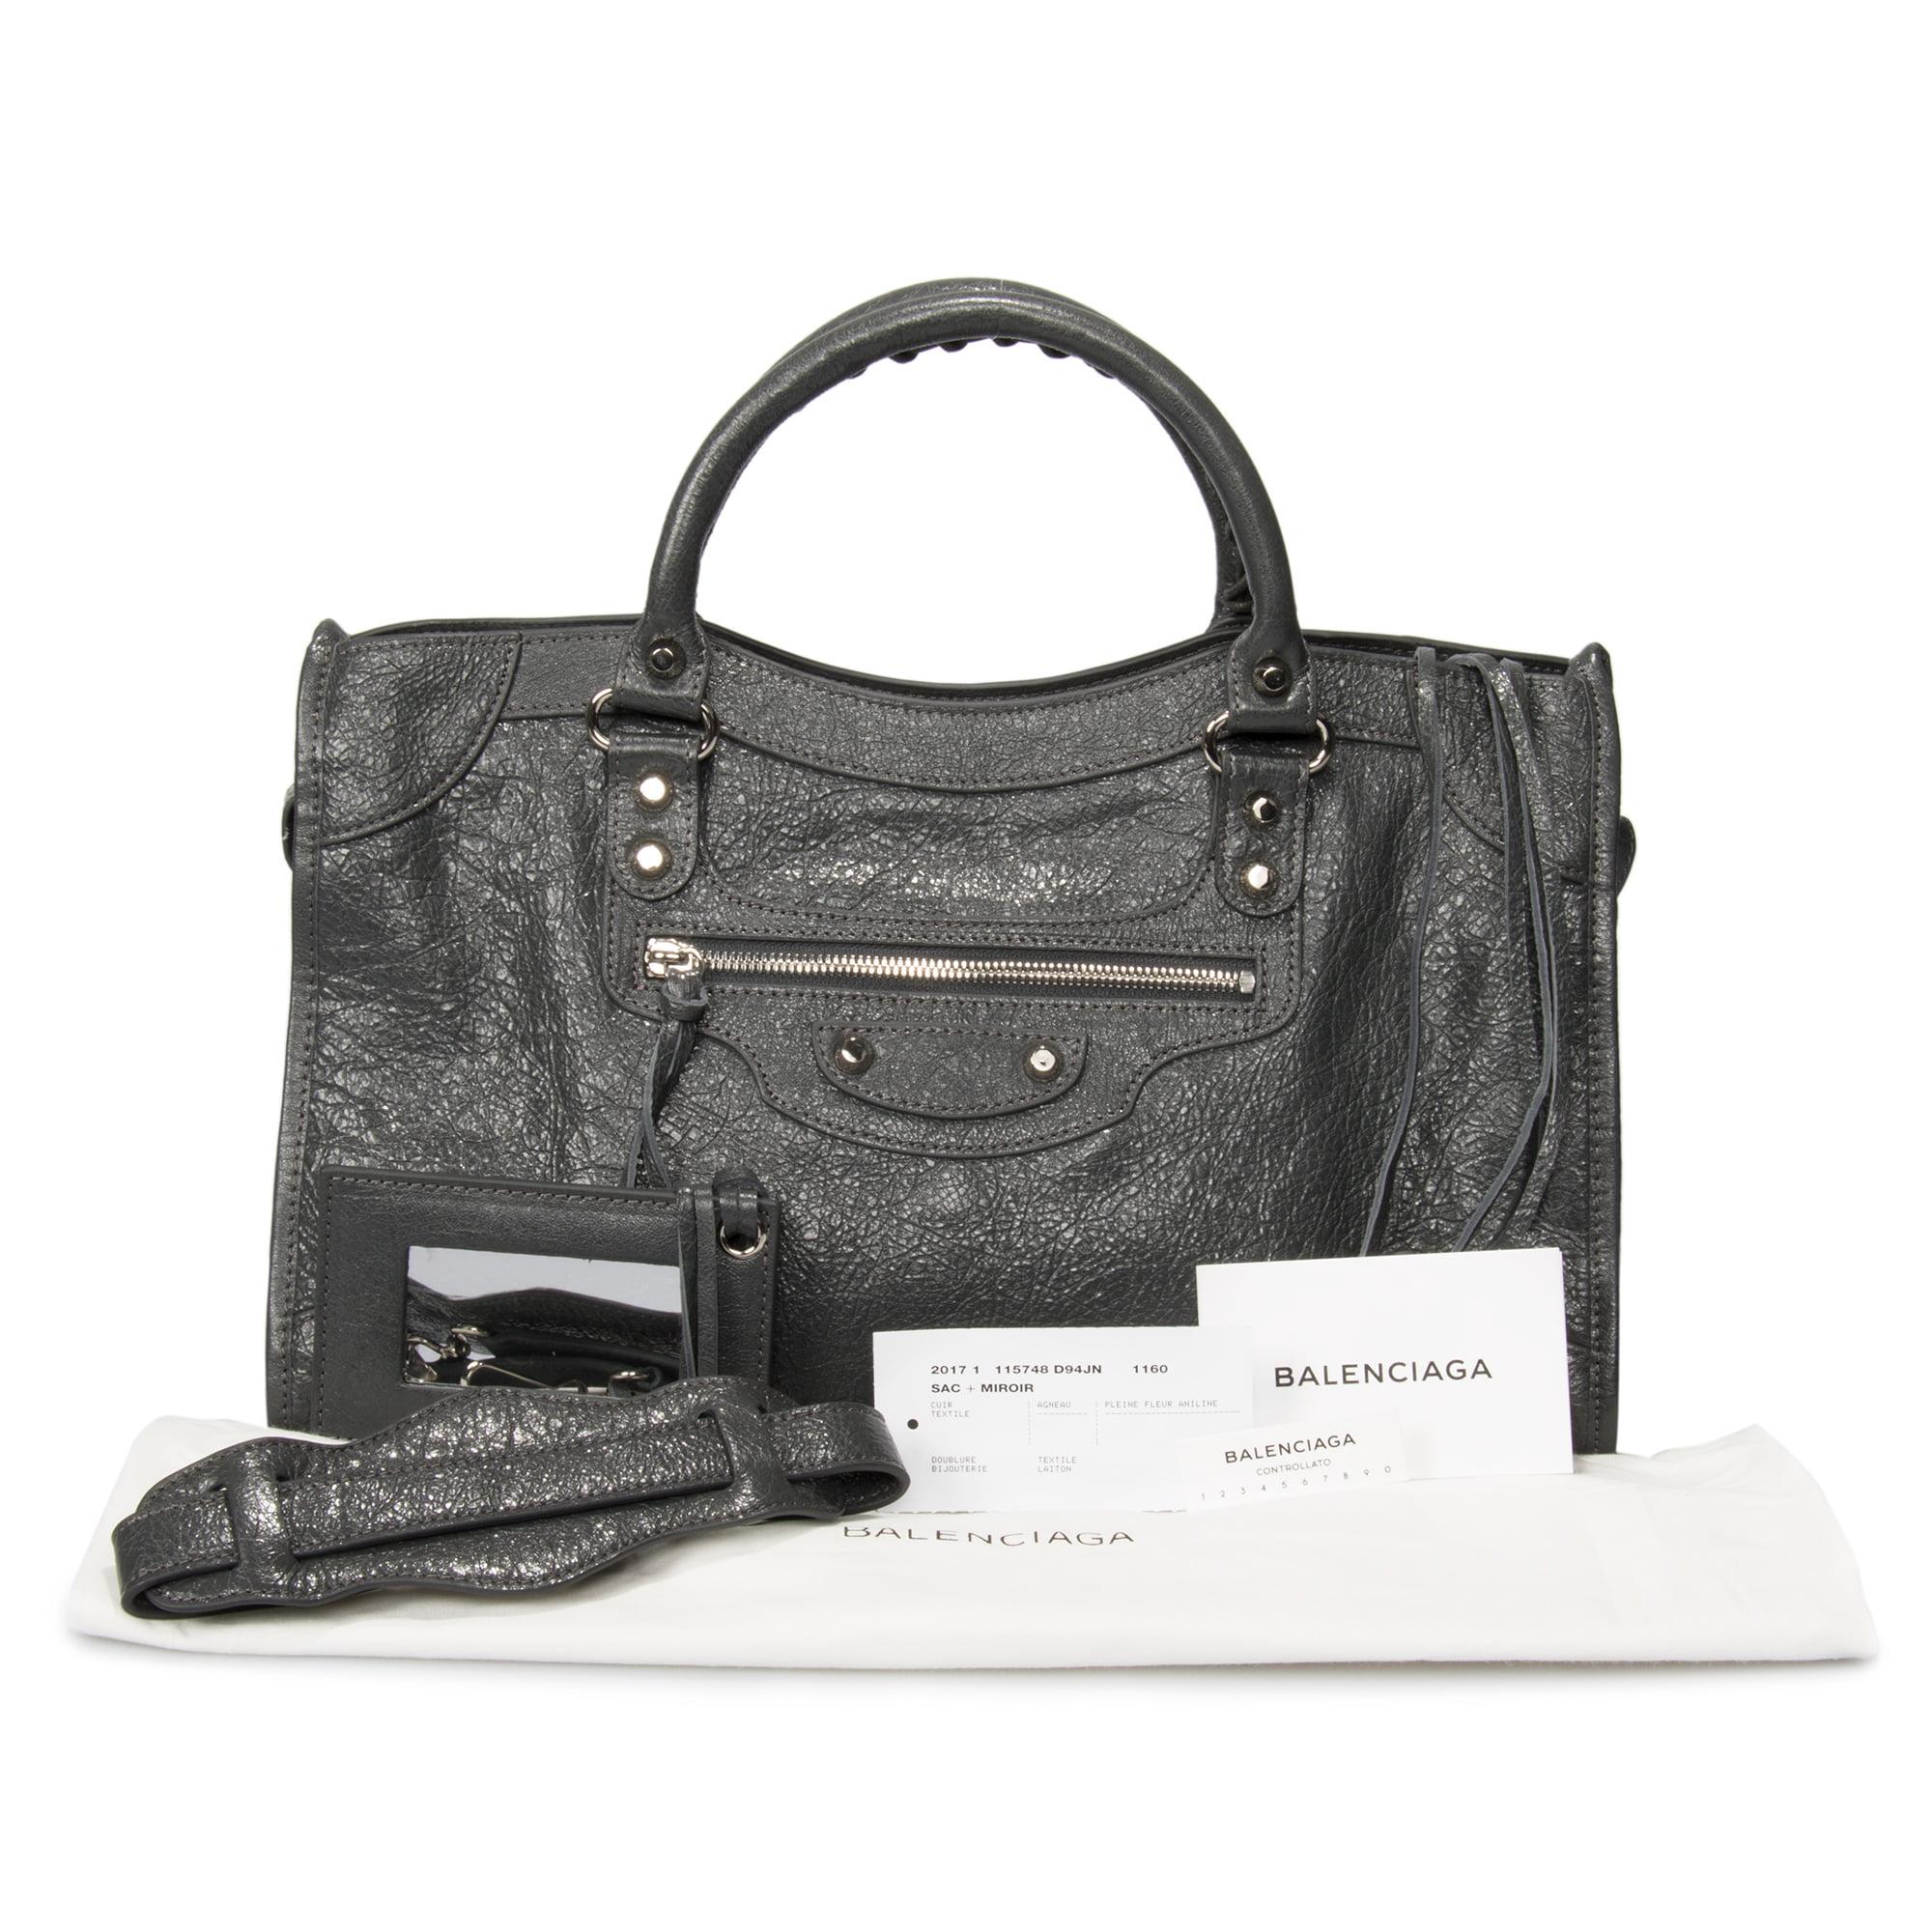 7e02bfe47b Balenciaga Classic City Bag | Fossil Gray with Silver Hardware | Medium -  Walmart.com